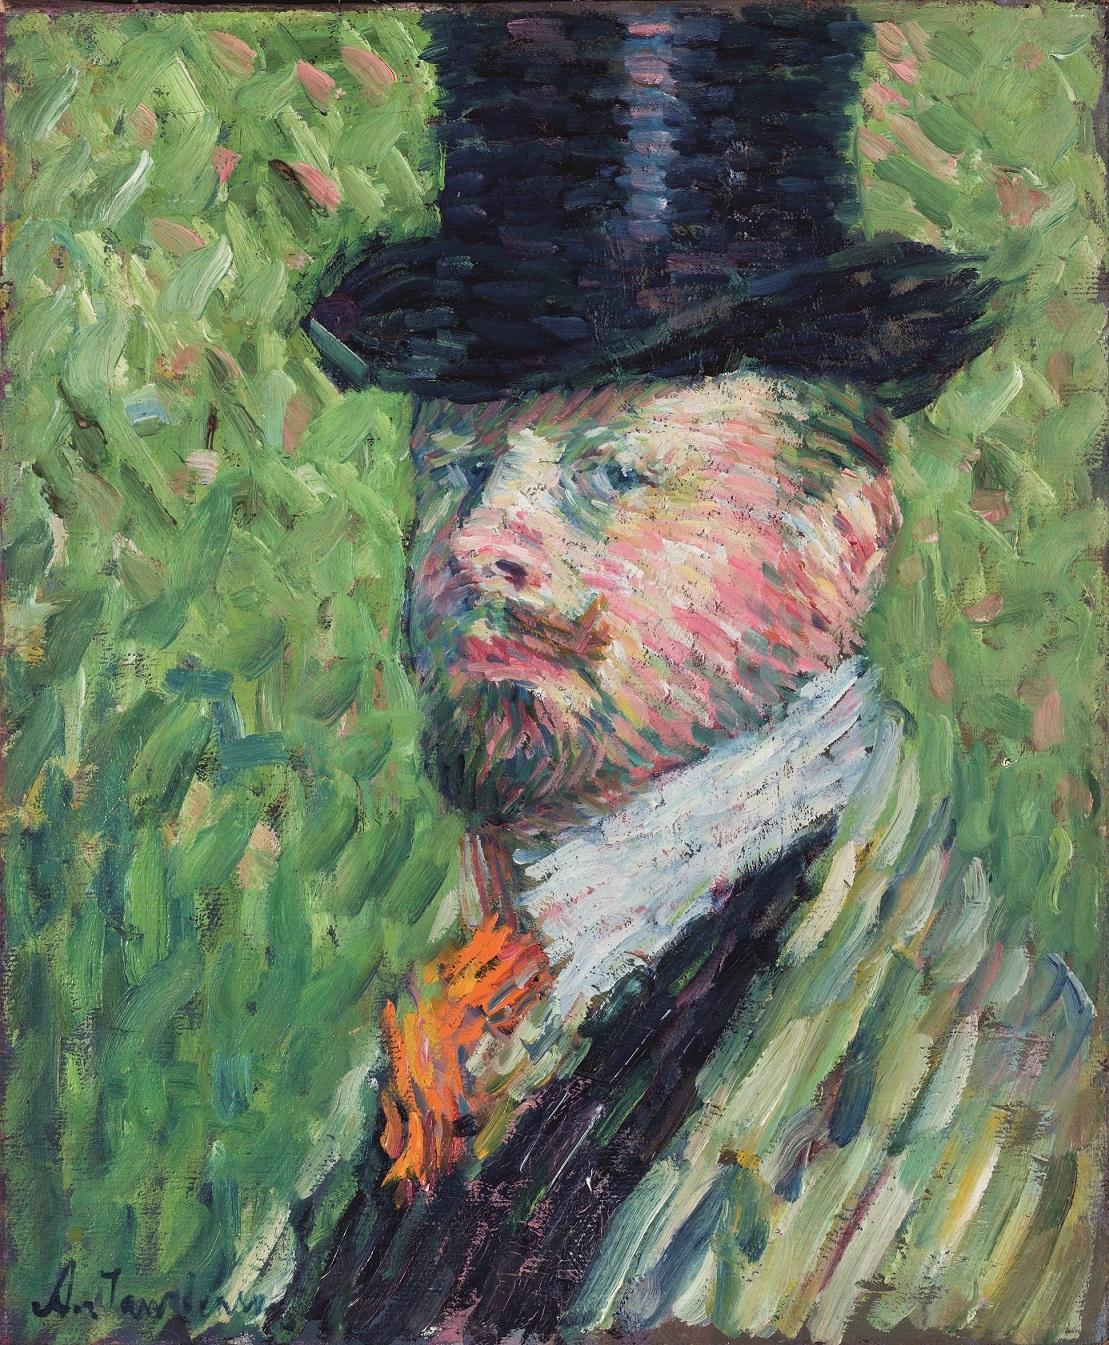 Self-portrait in top hat, Alexej von Jawlensky